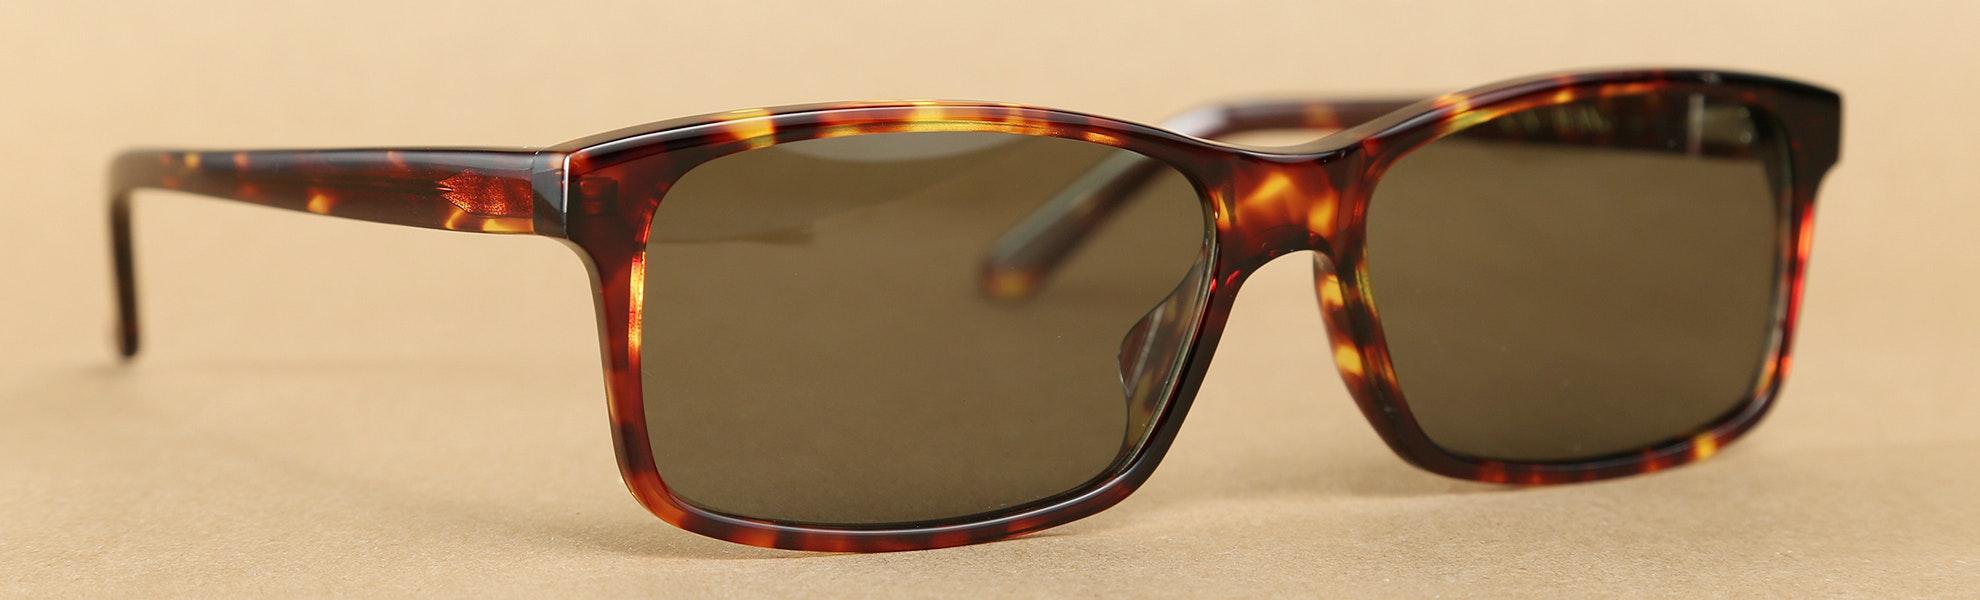 Kent Wang Fleming Sunglasses